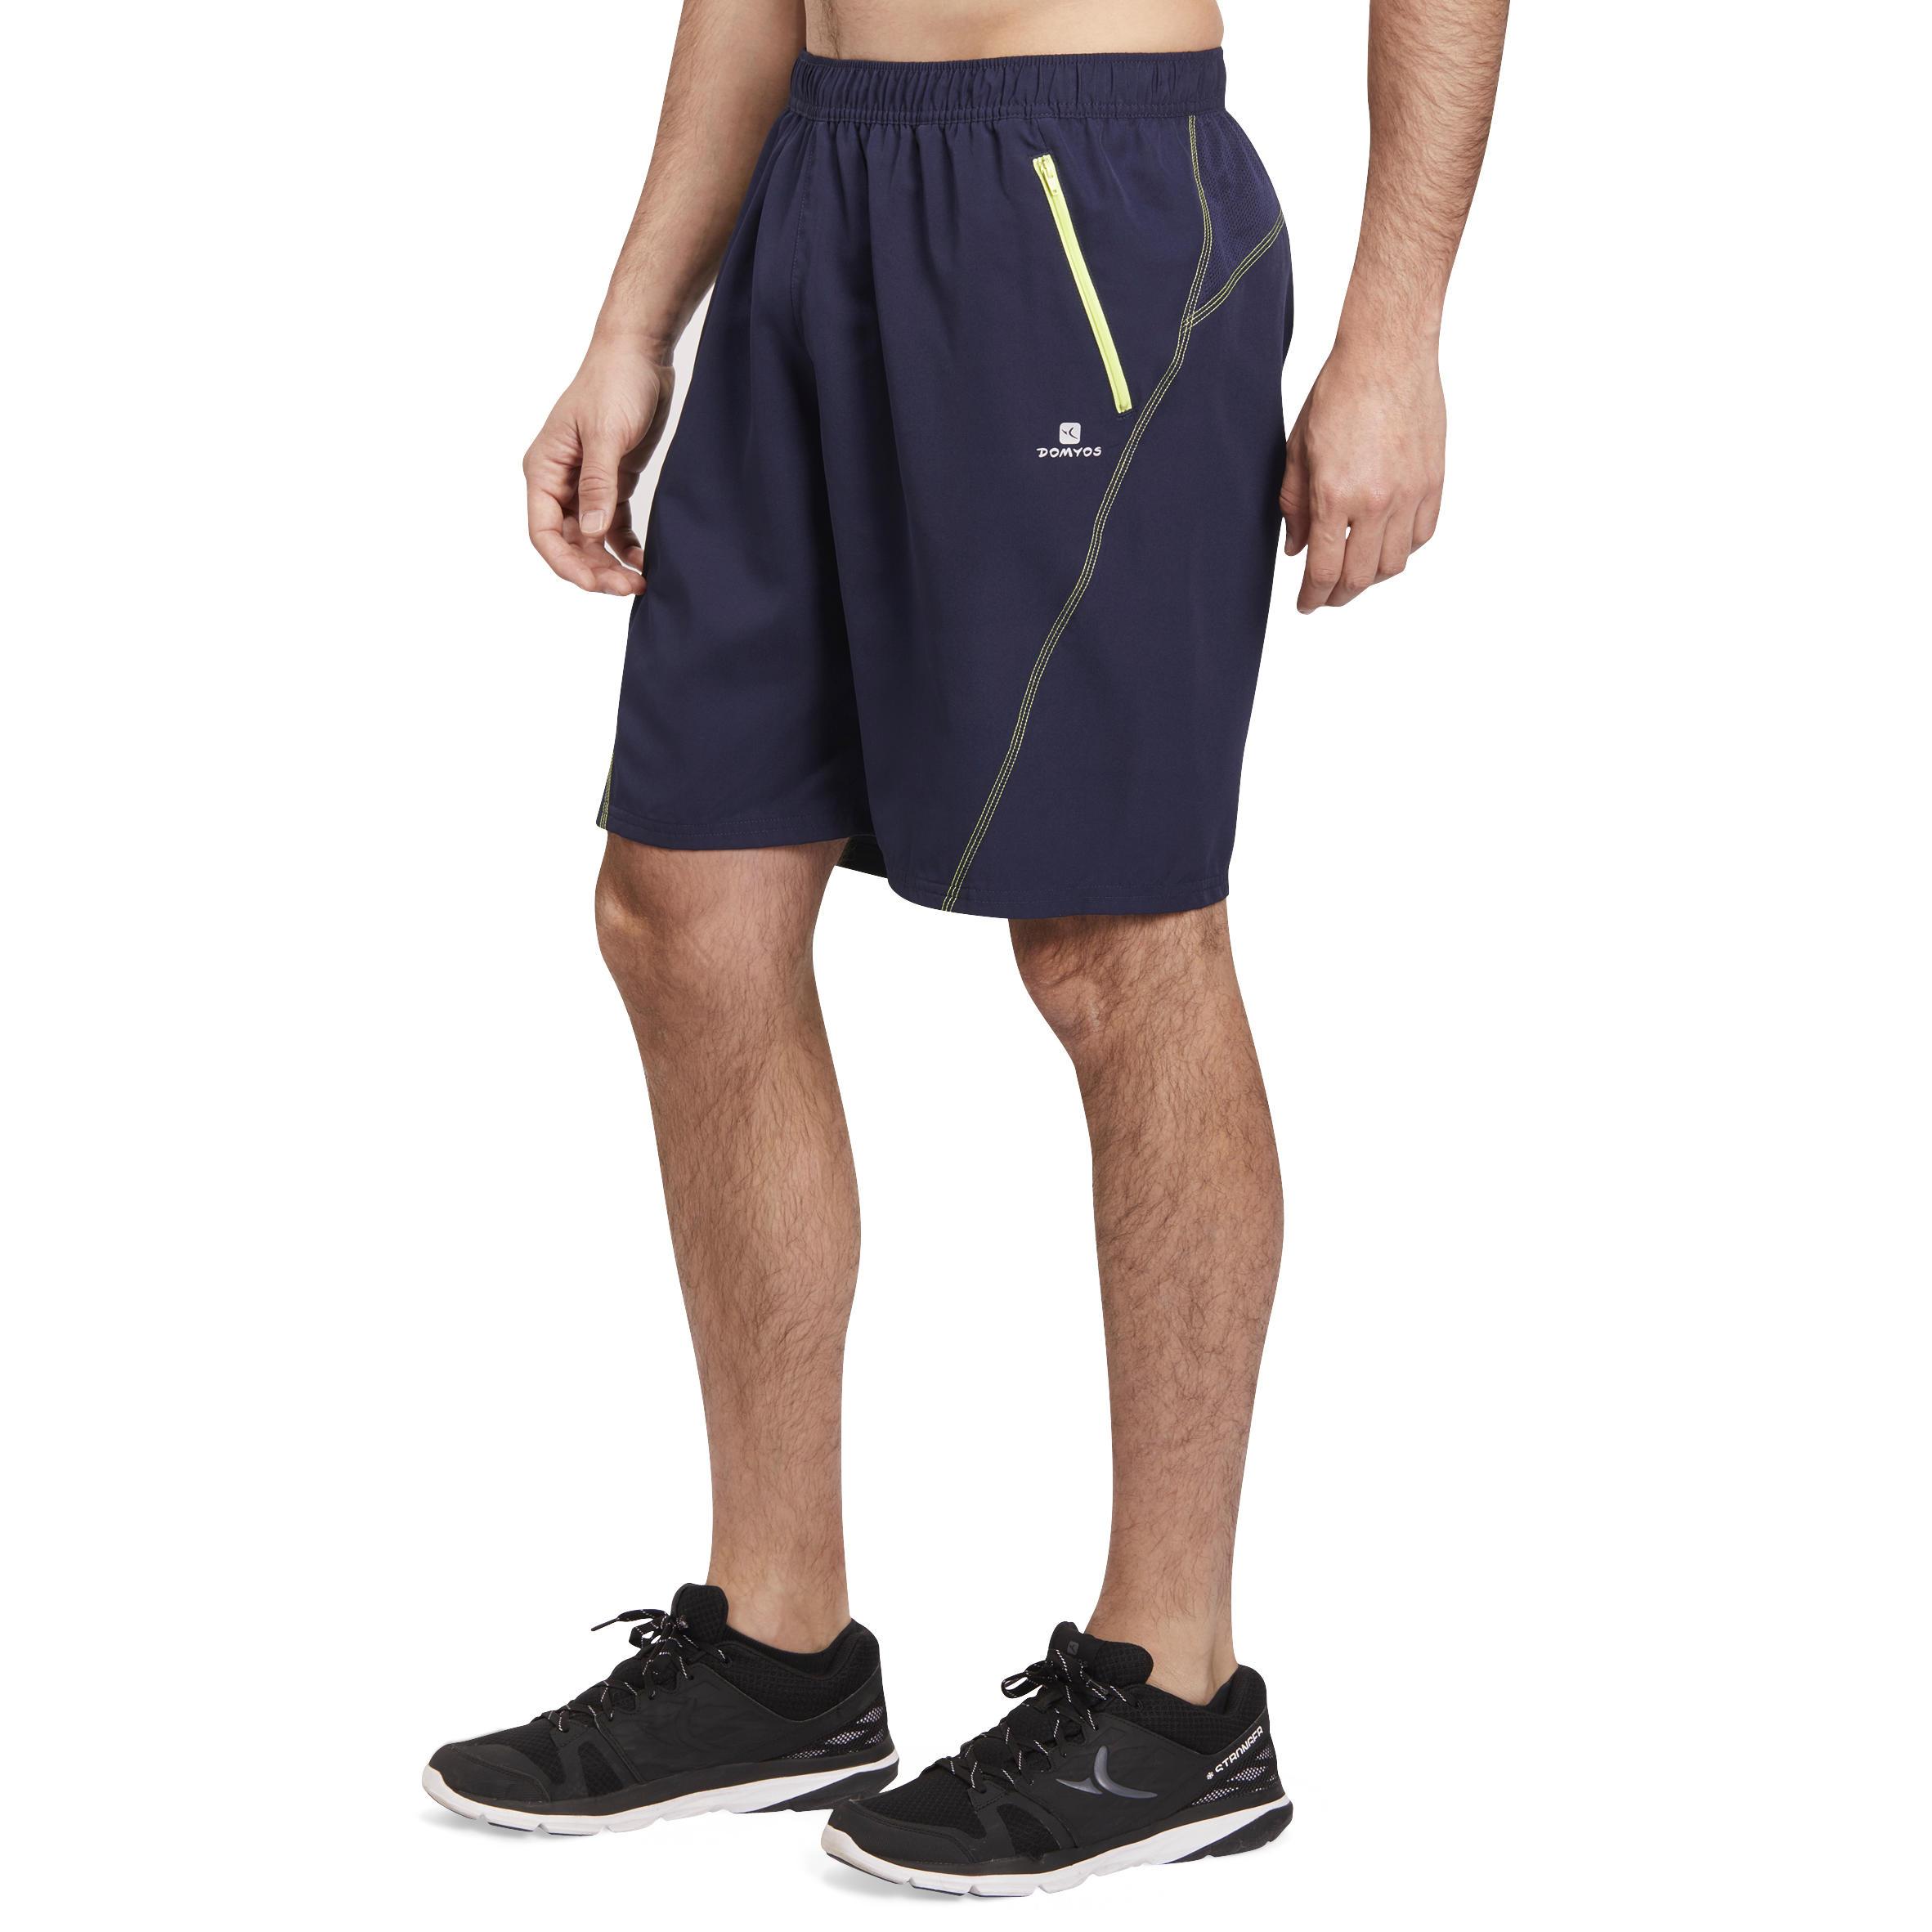 Energy Cardio Fitness Shorts - Blue/Yellow